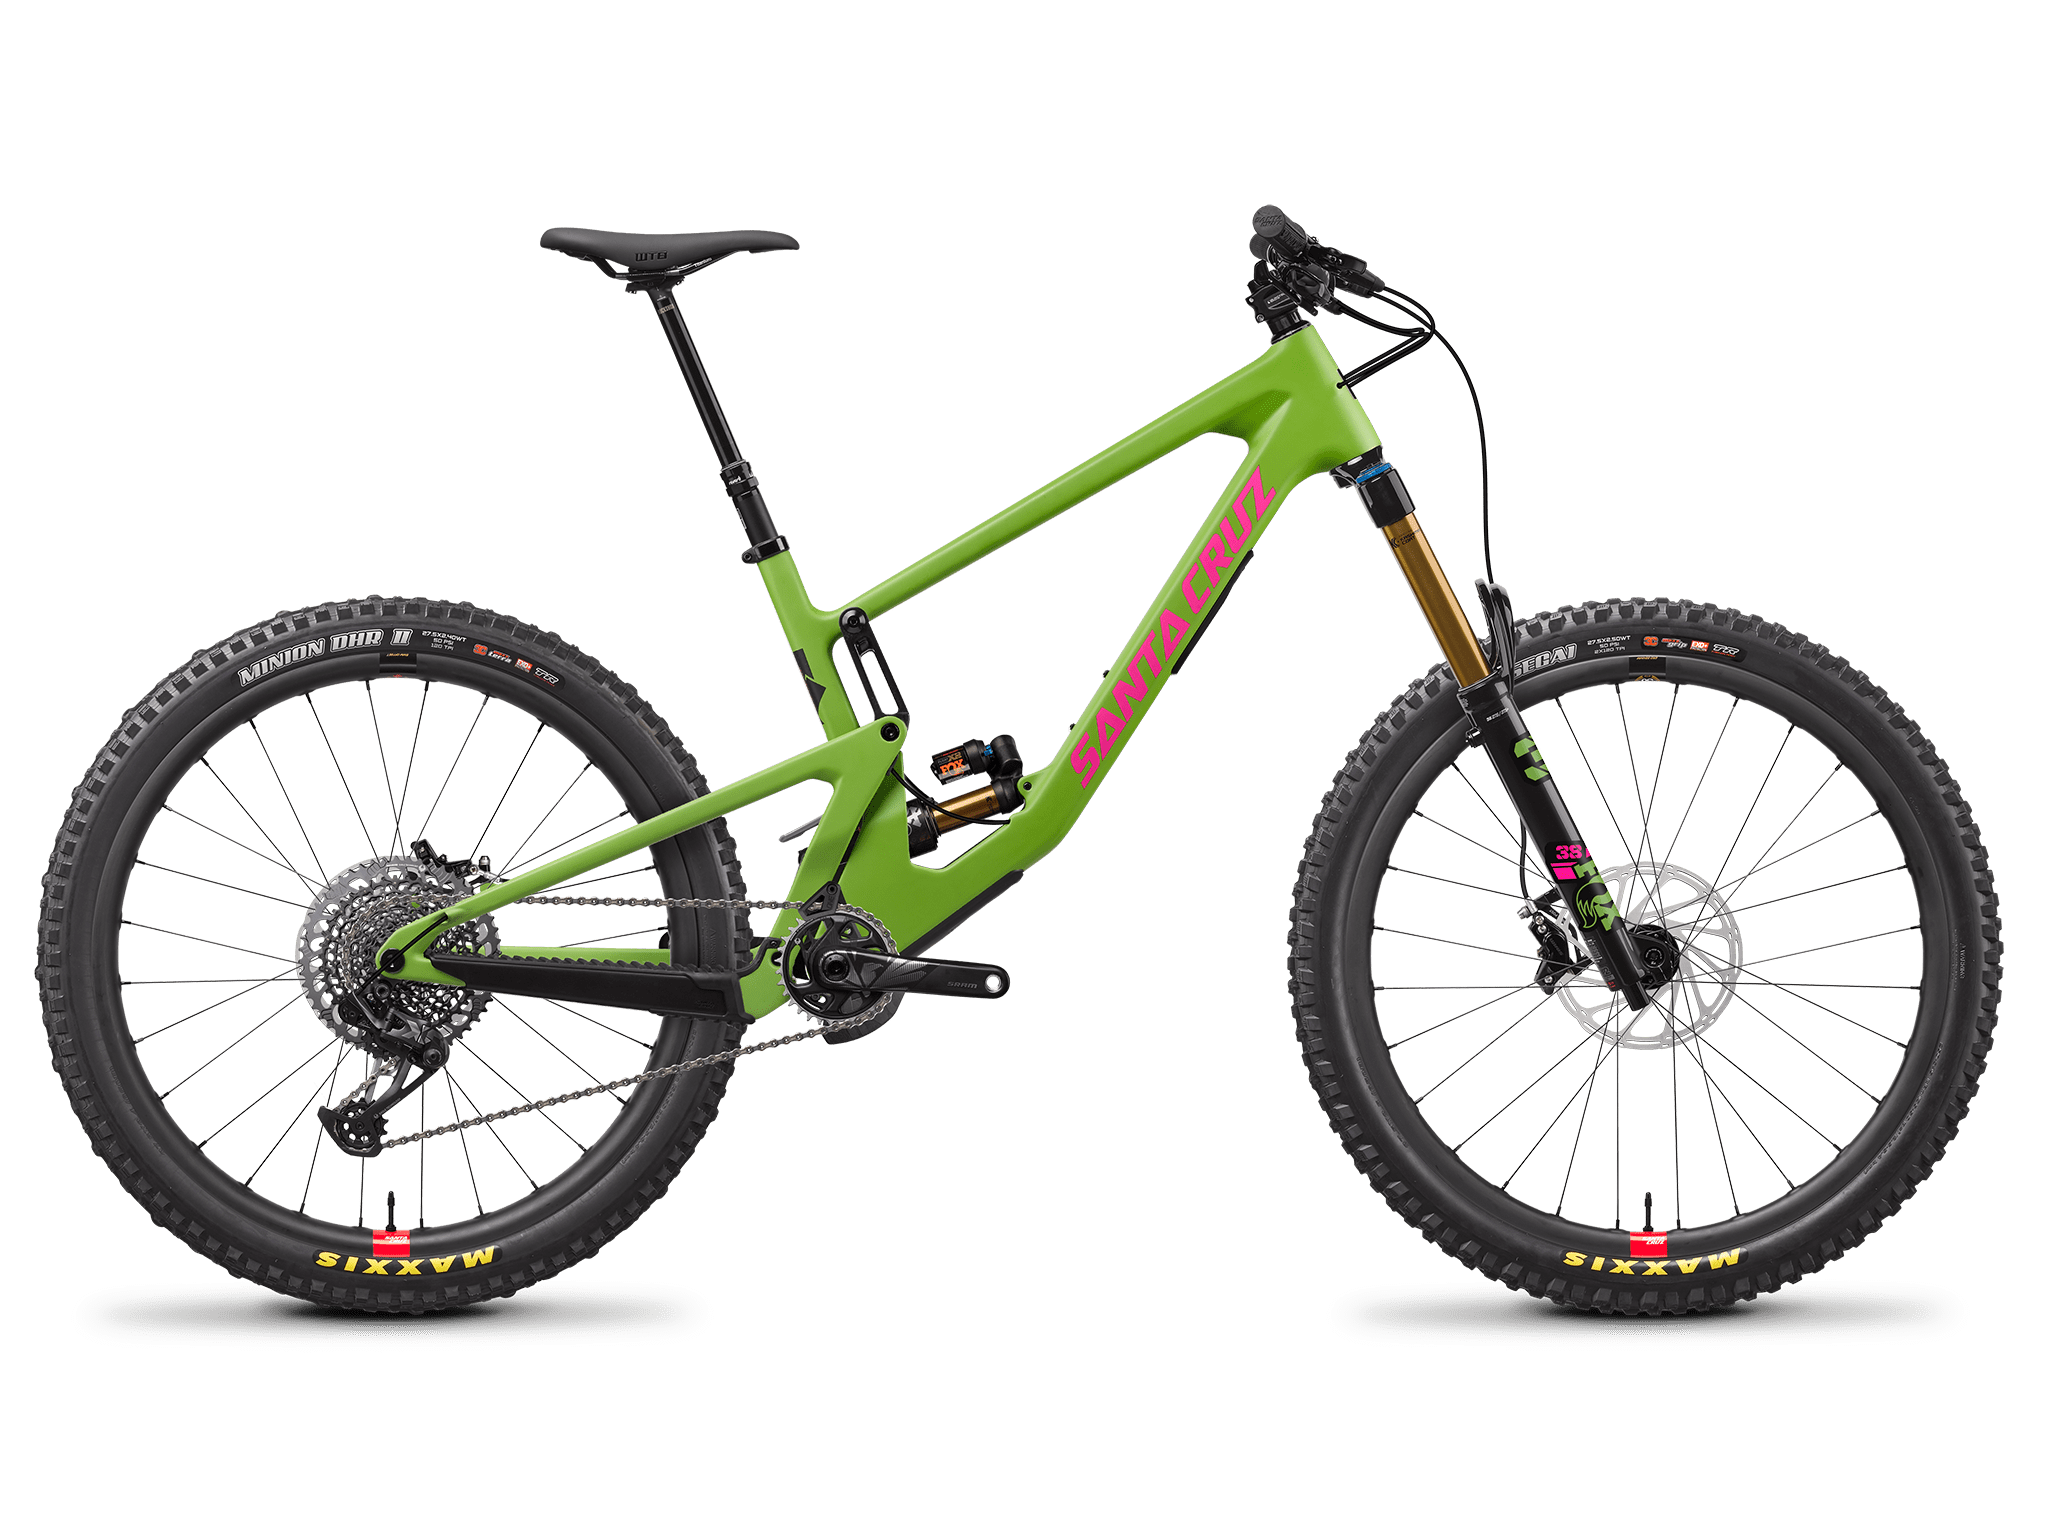 Santa Cruz Nomad V5 Carbon CC X01 Coil Kit | Modell 2022